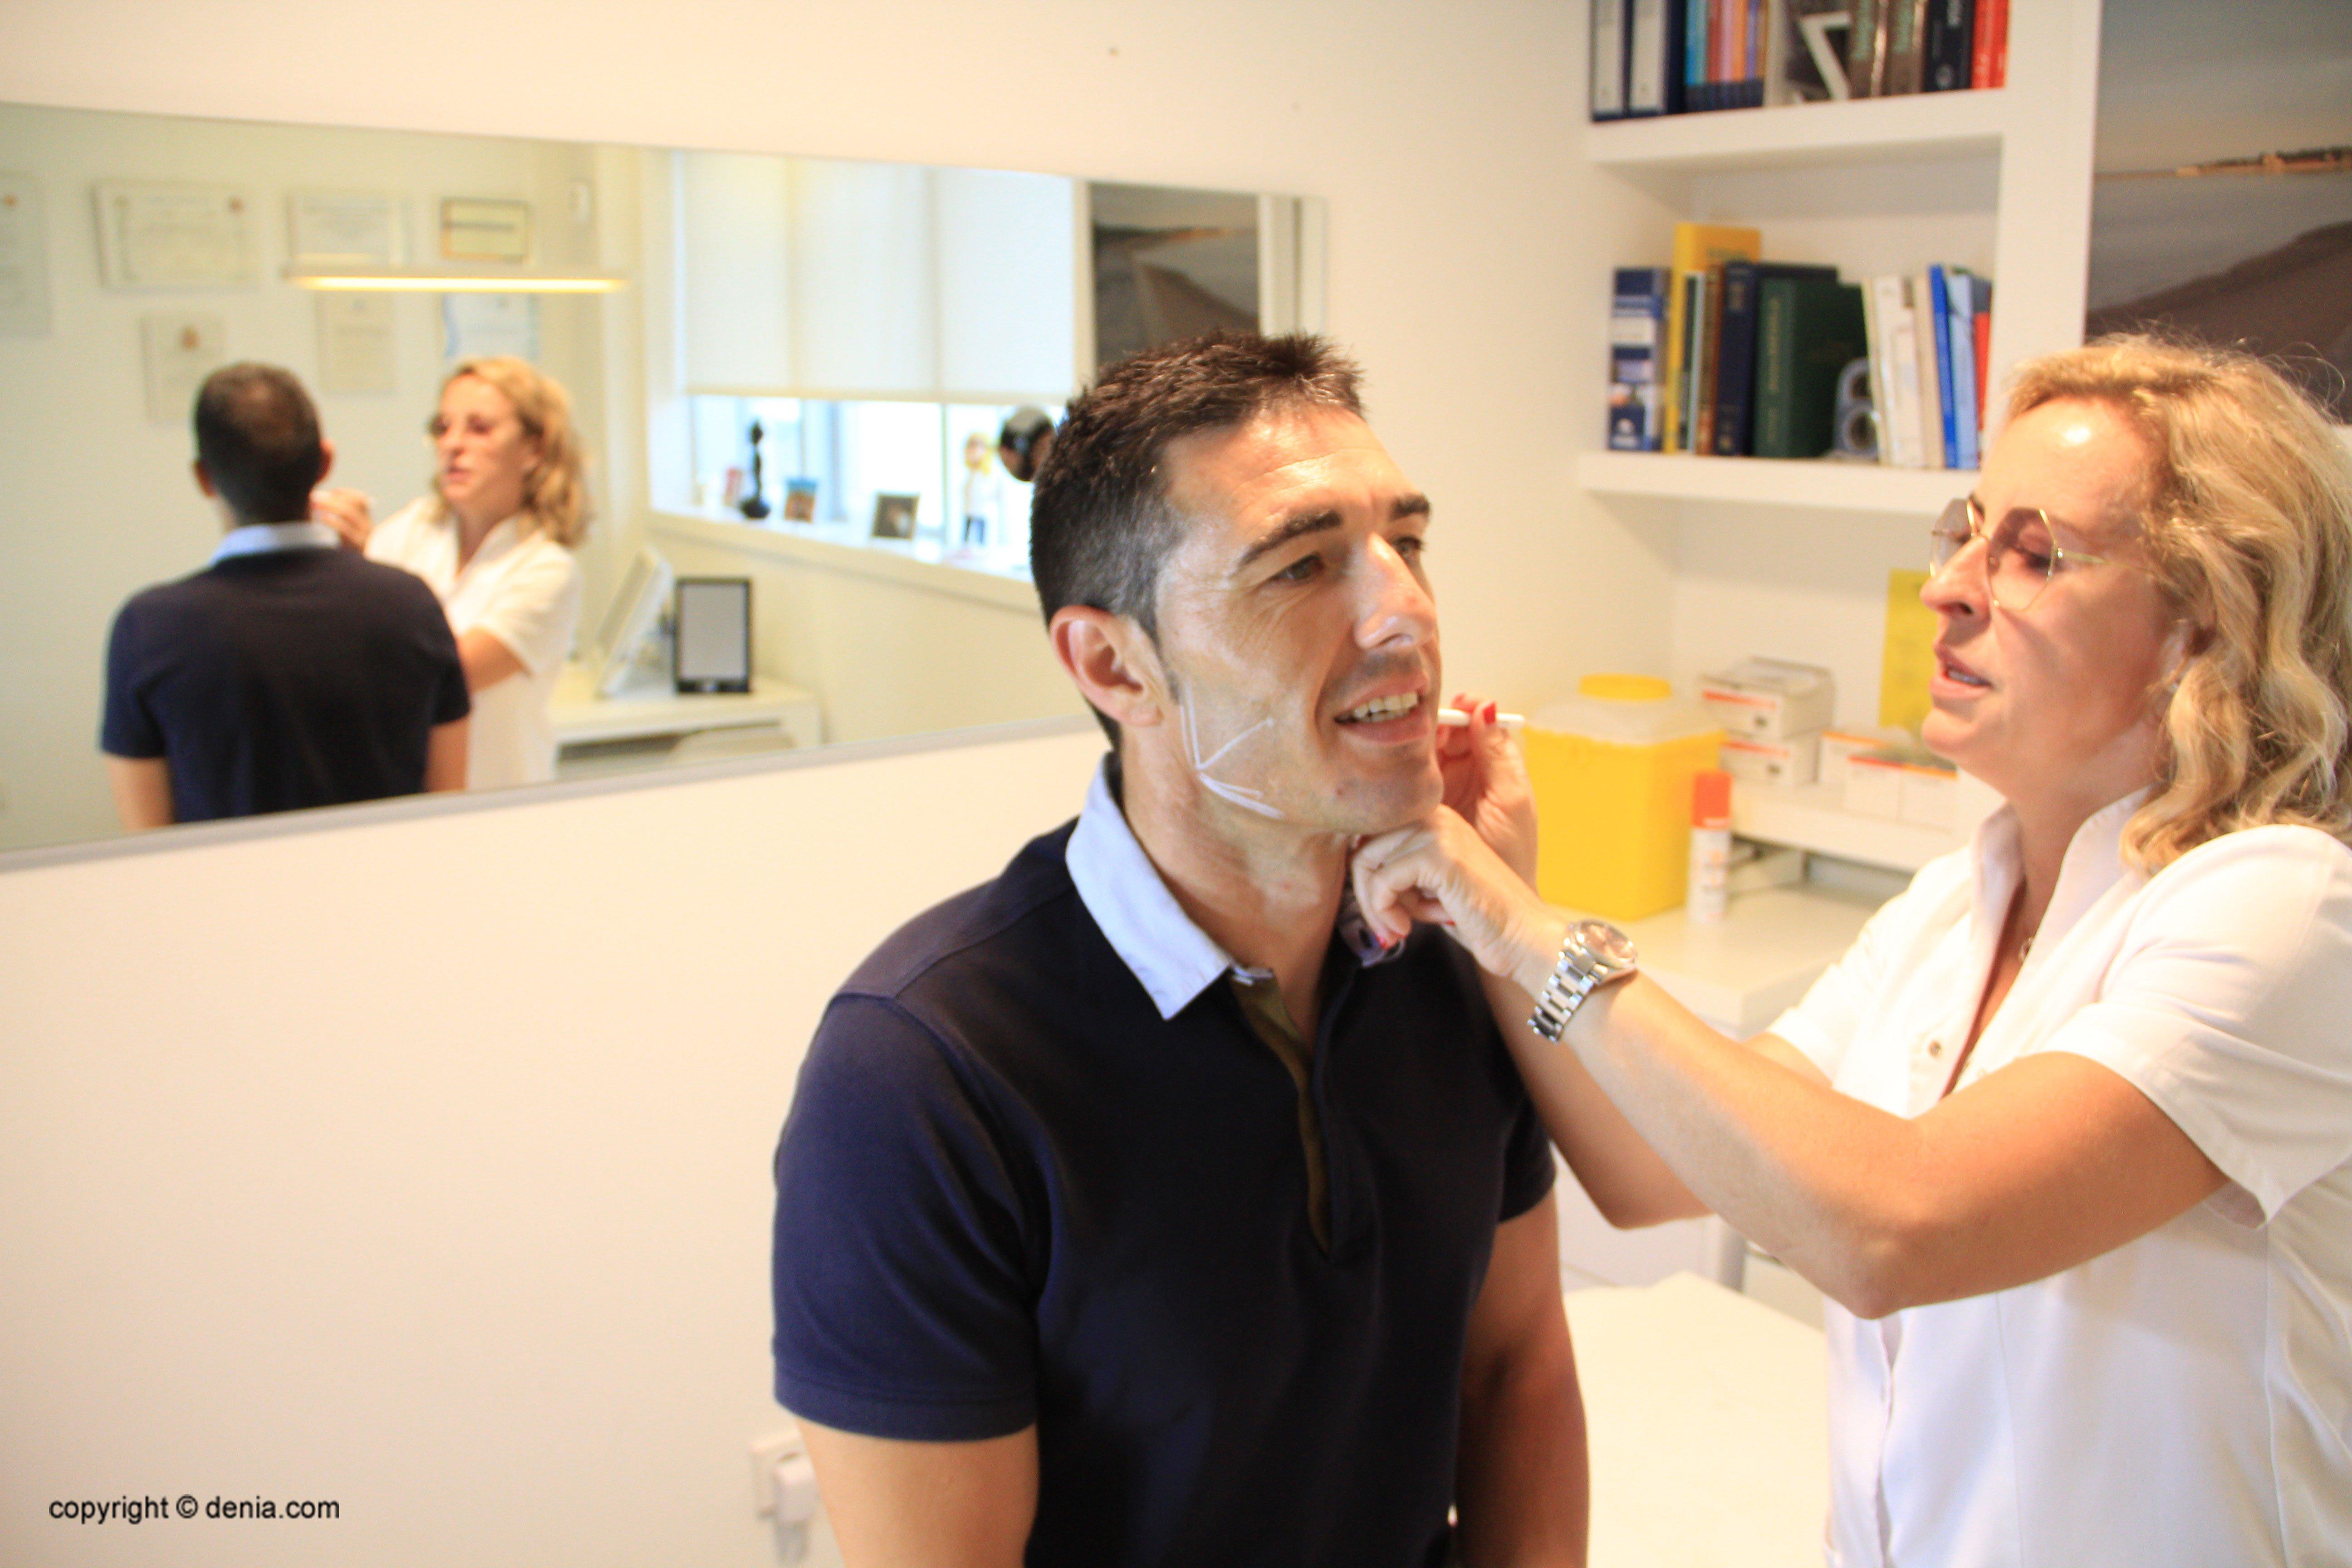 Realçar mandíbula homes - Clínica Estètica Castelblanque